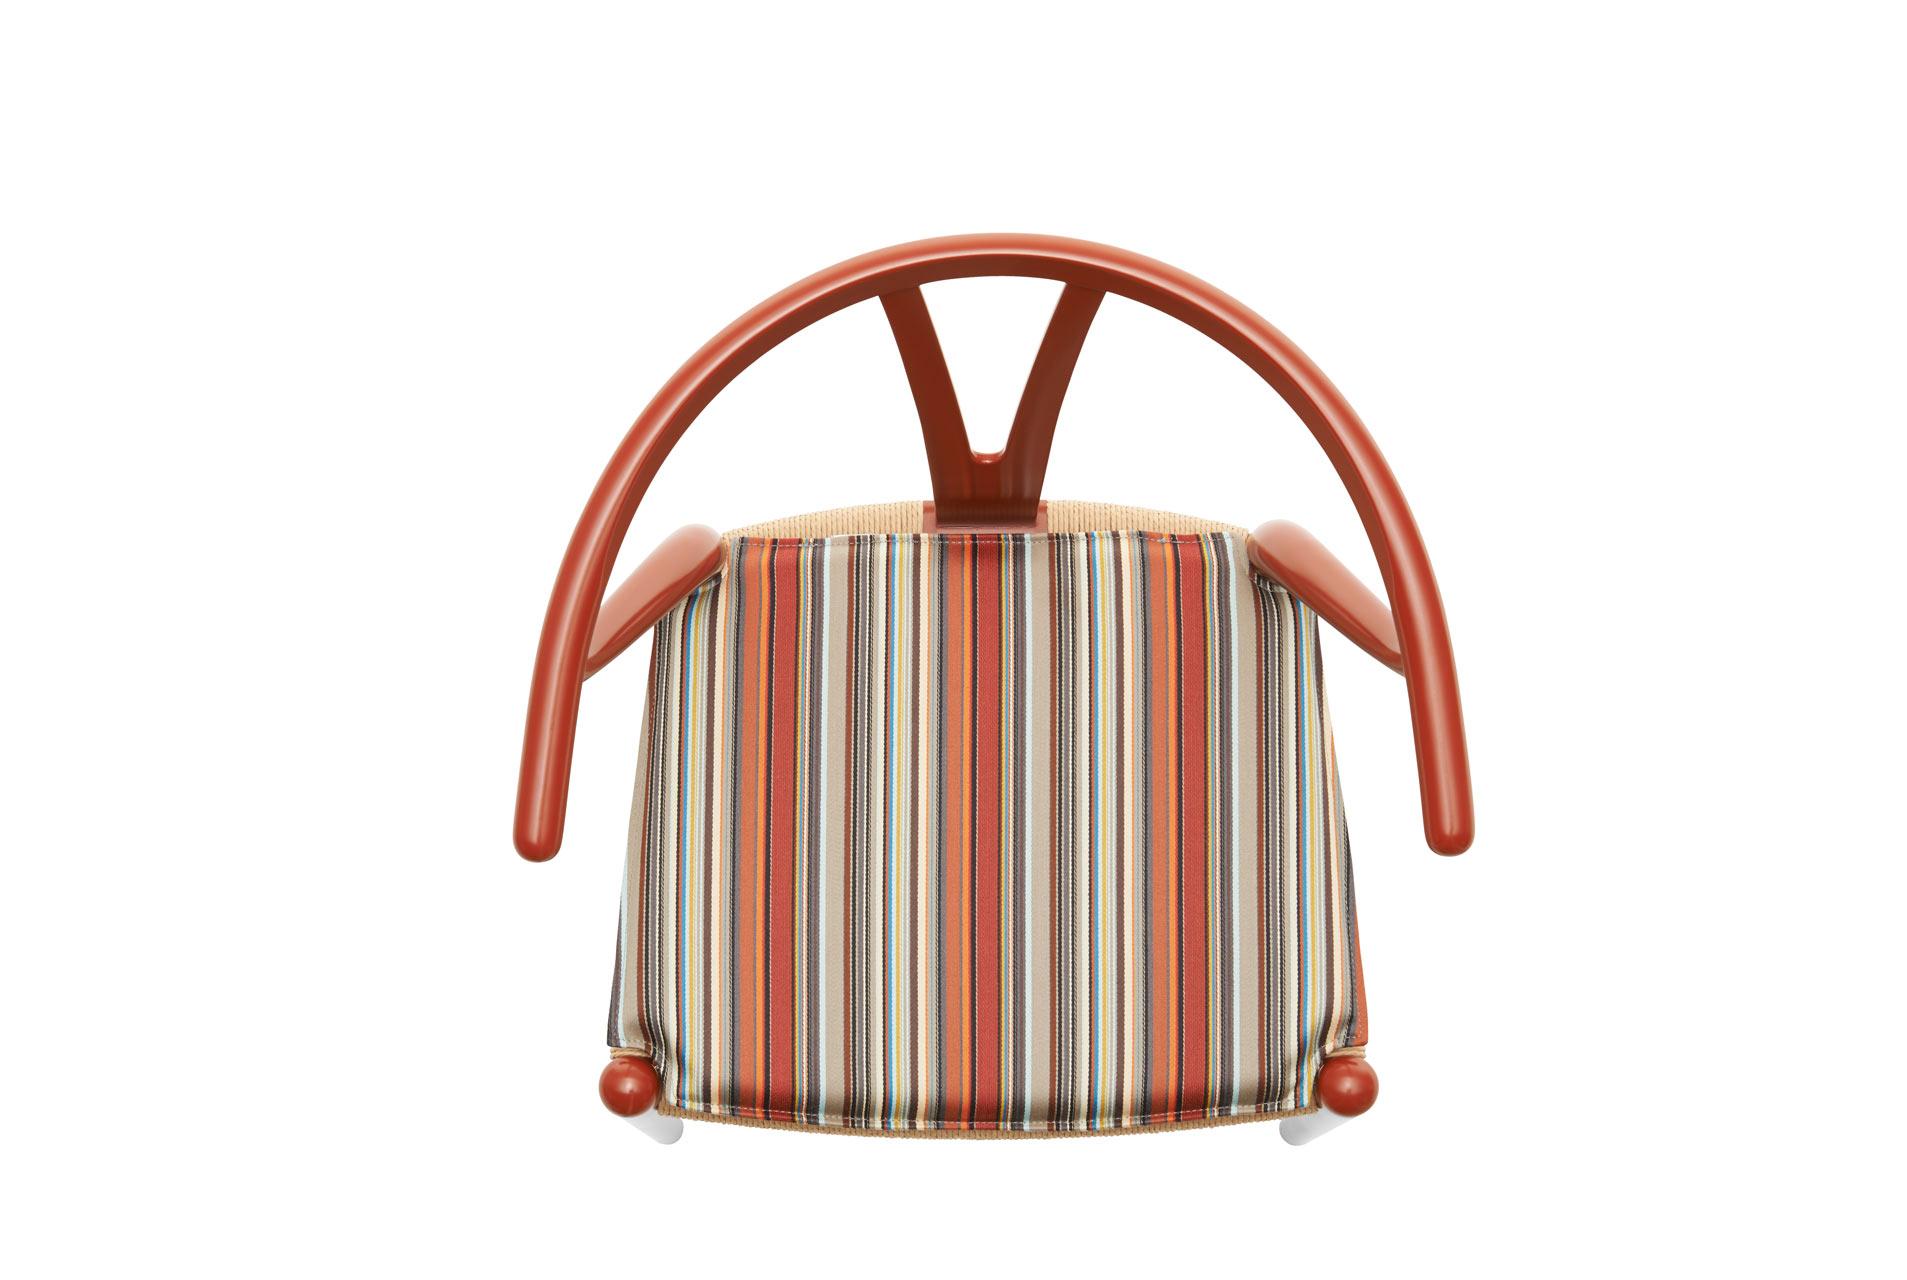 CH24 Wishbone Chair - Stripes